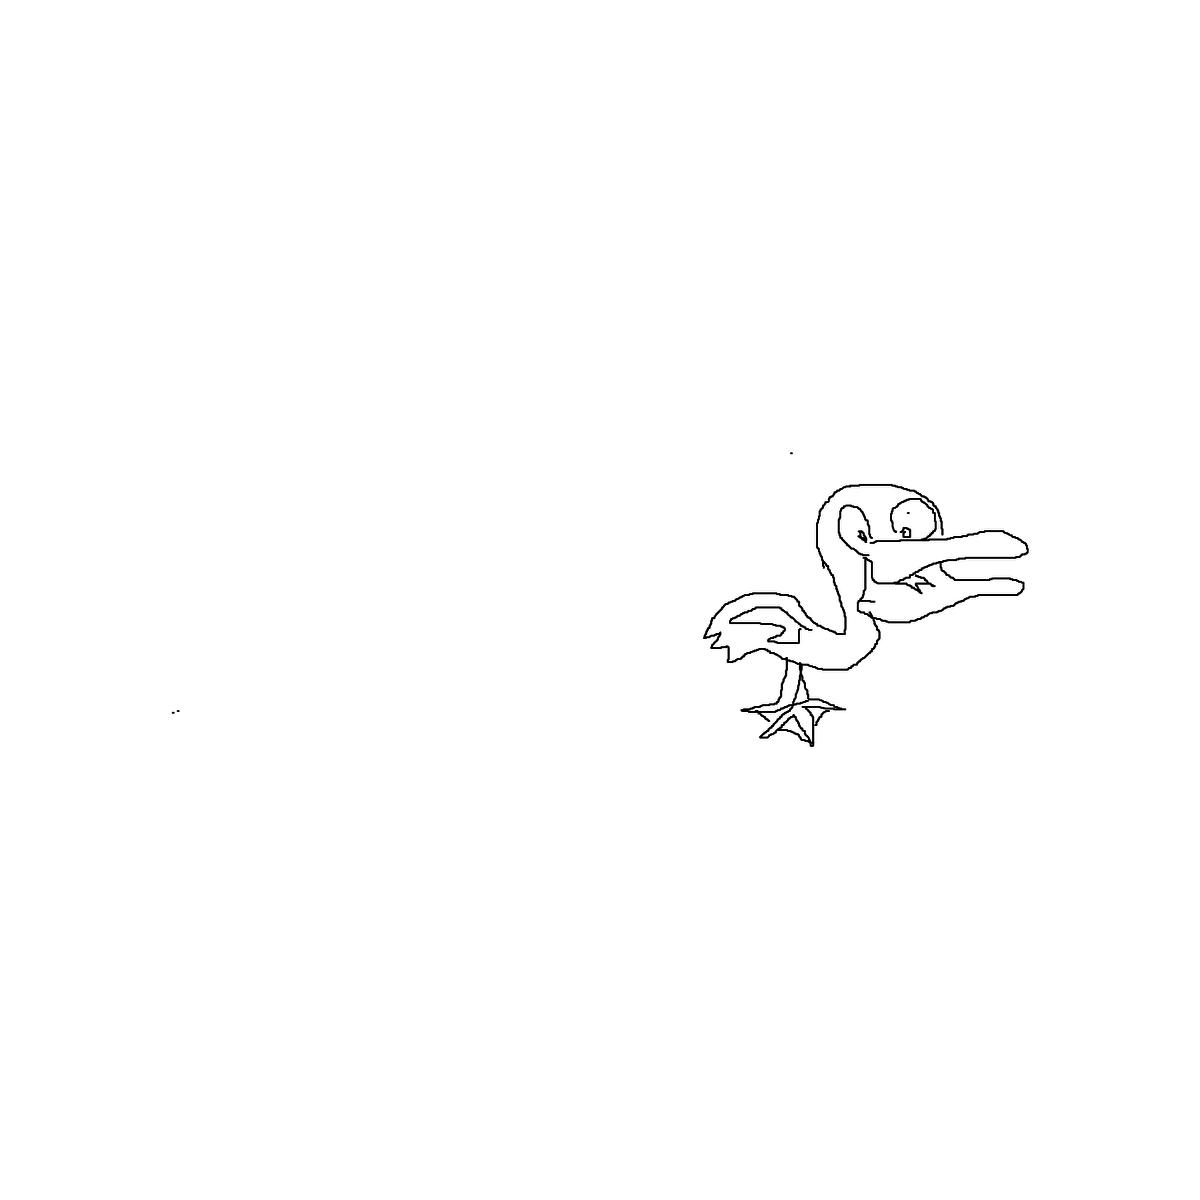 BAAAM drawing#1631 lat:41.1394653320312500lng: -8.6966514587402340